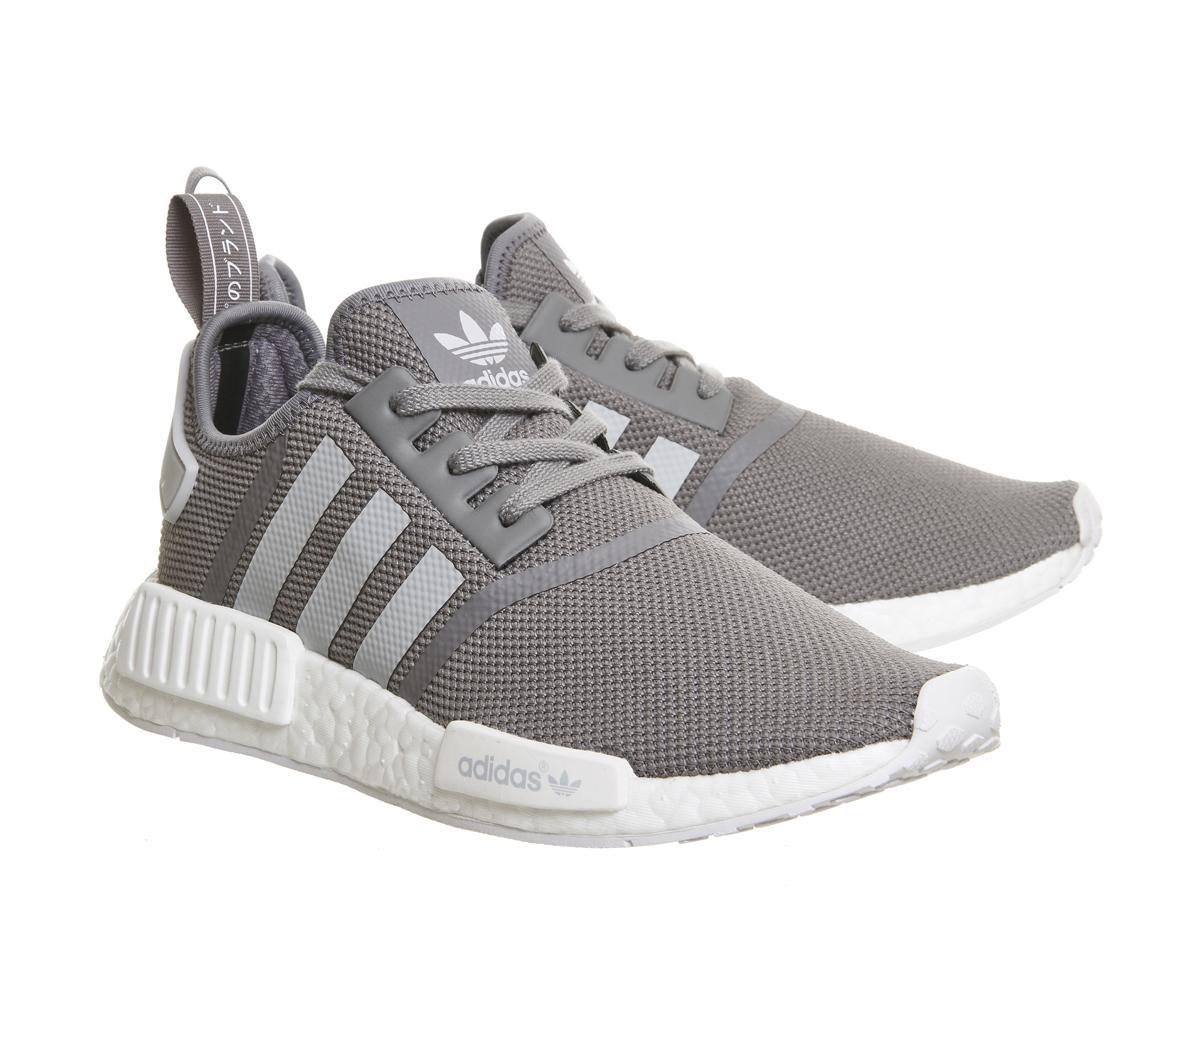 best service 1b077 af1e7 ... release date wholesale lyst adidas originals nmd runner in gray for men  3467d 057a0 6d855 5d286